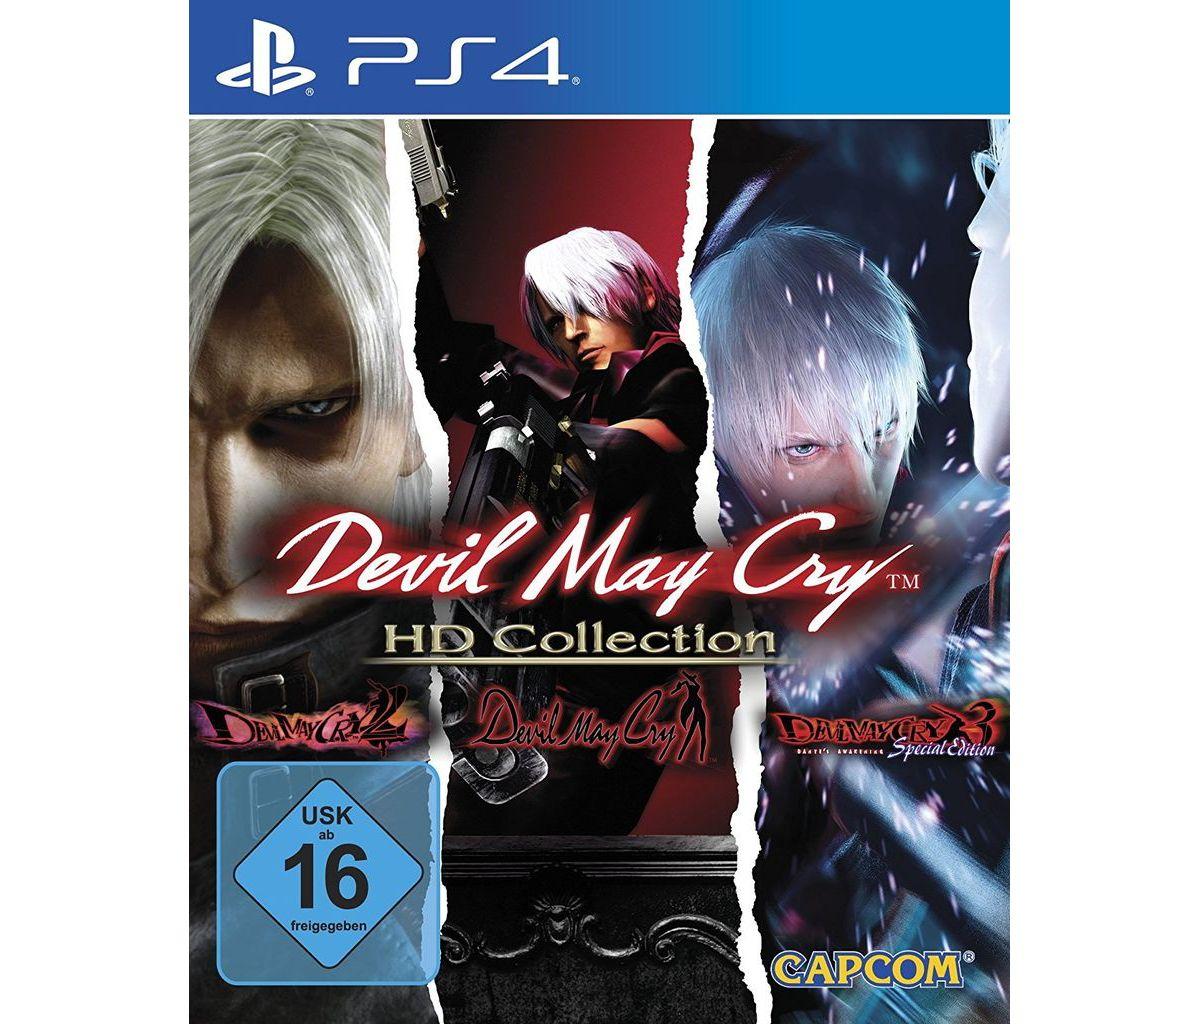 Capcom Playstation 4 - Spiel »Devil May Cry HD ...